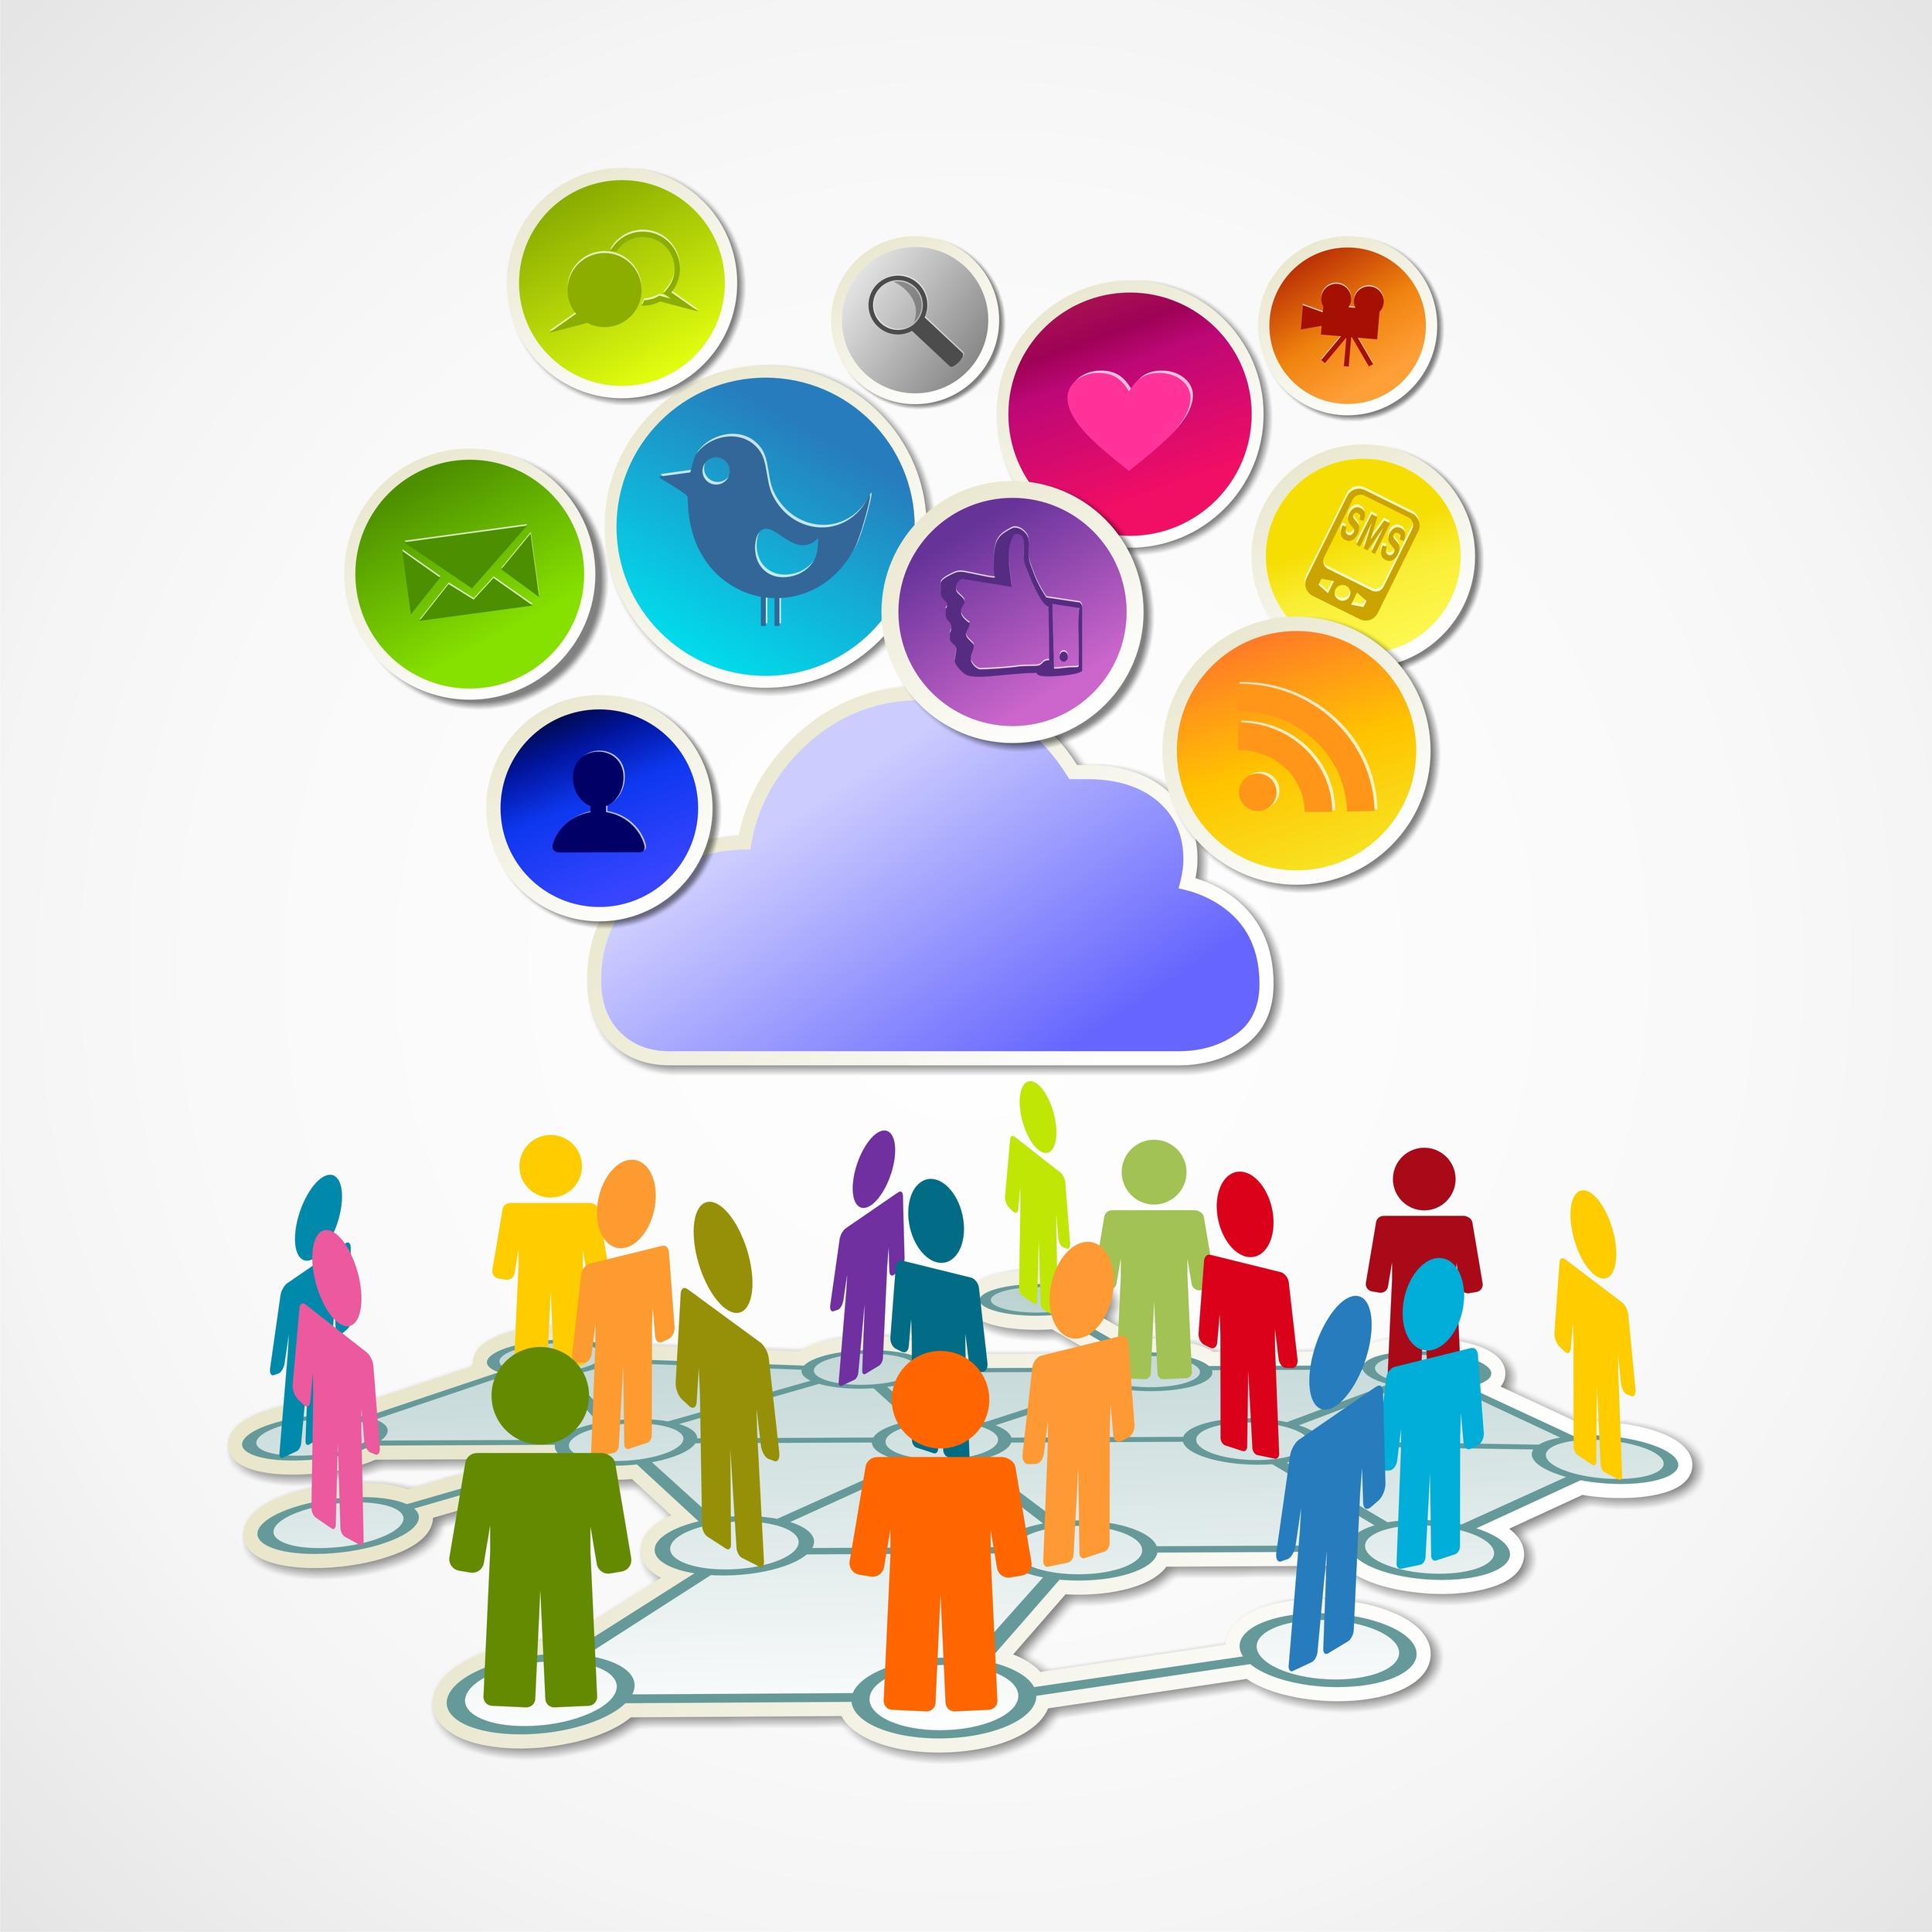 Digital_Pollinators_Social_Media_Marketing_Workshop